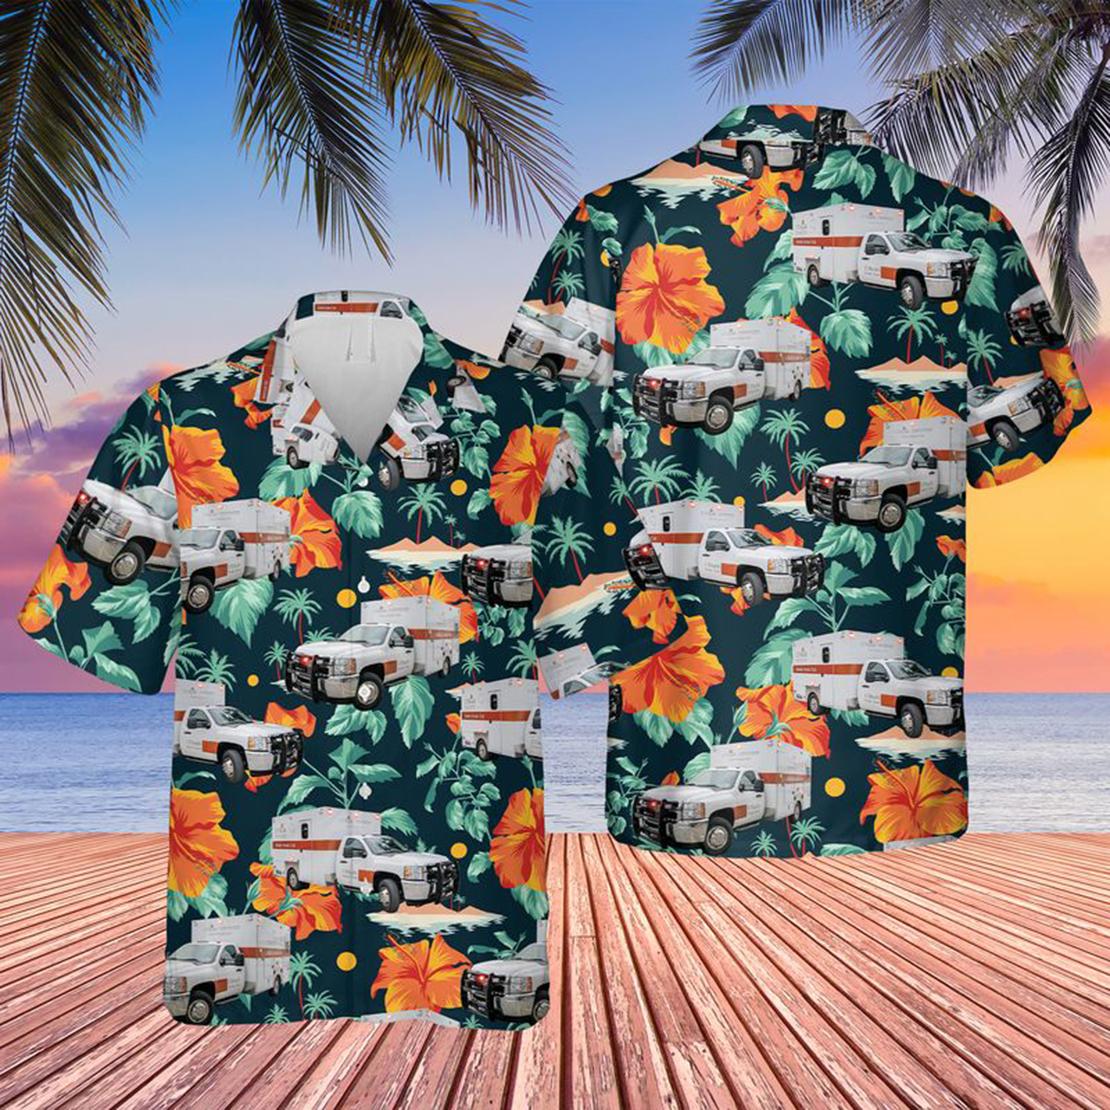 Houston, Texas UTHealth Mobile Stroke Unit Hawaiian Shirt